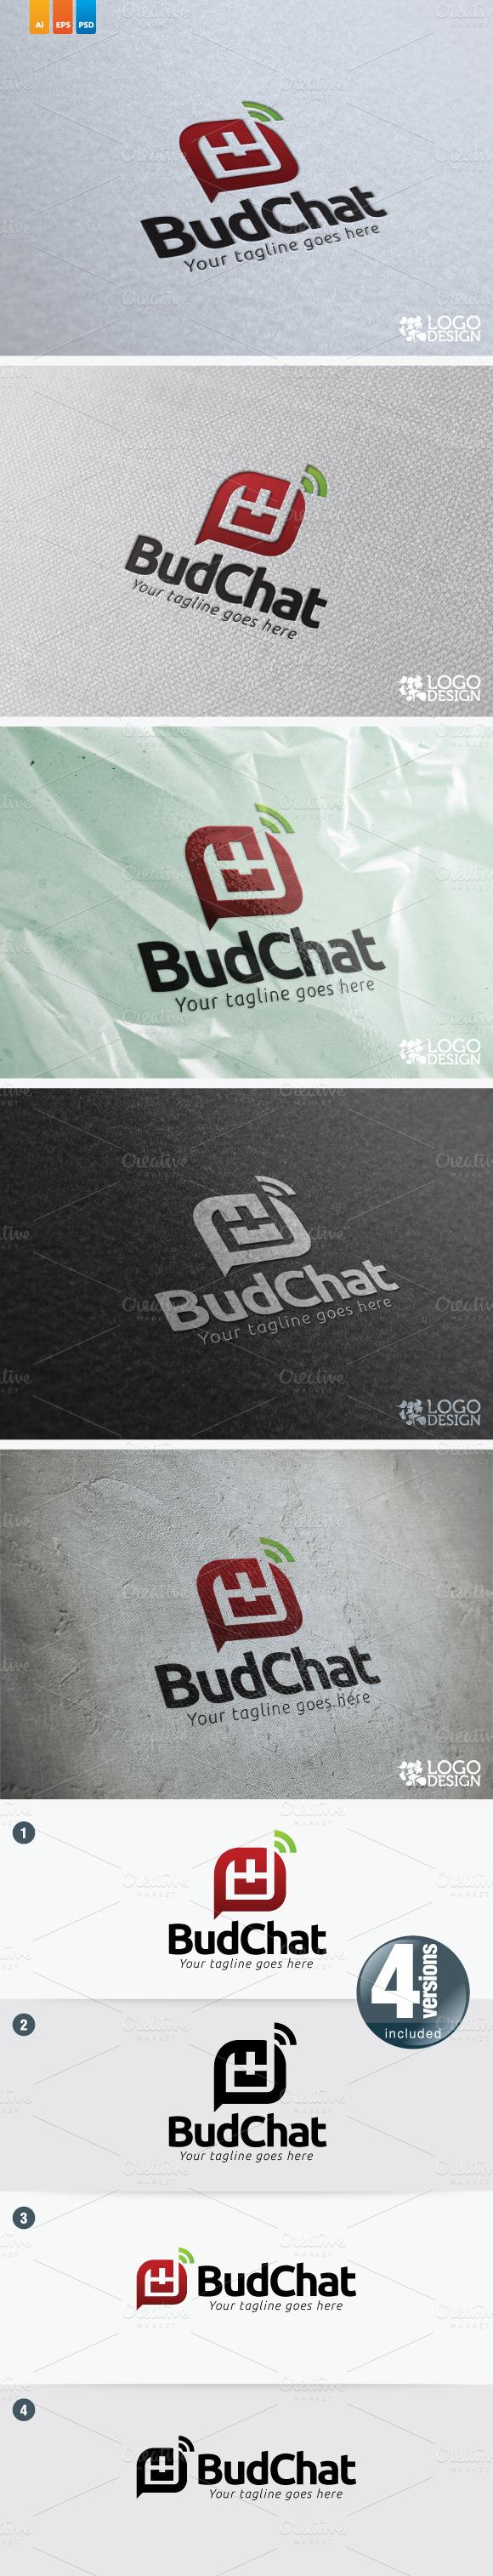 Bud Chat